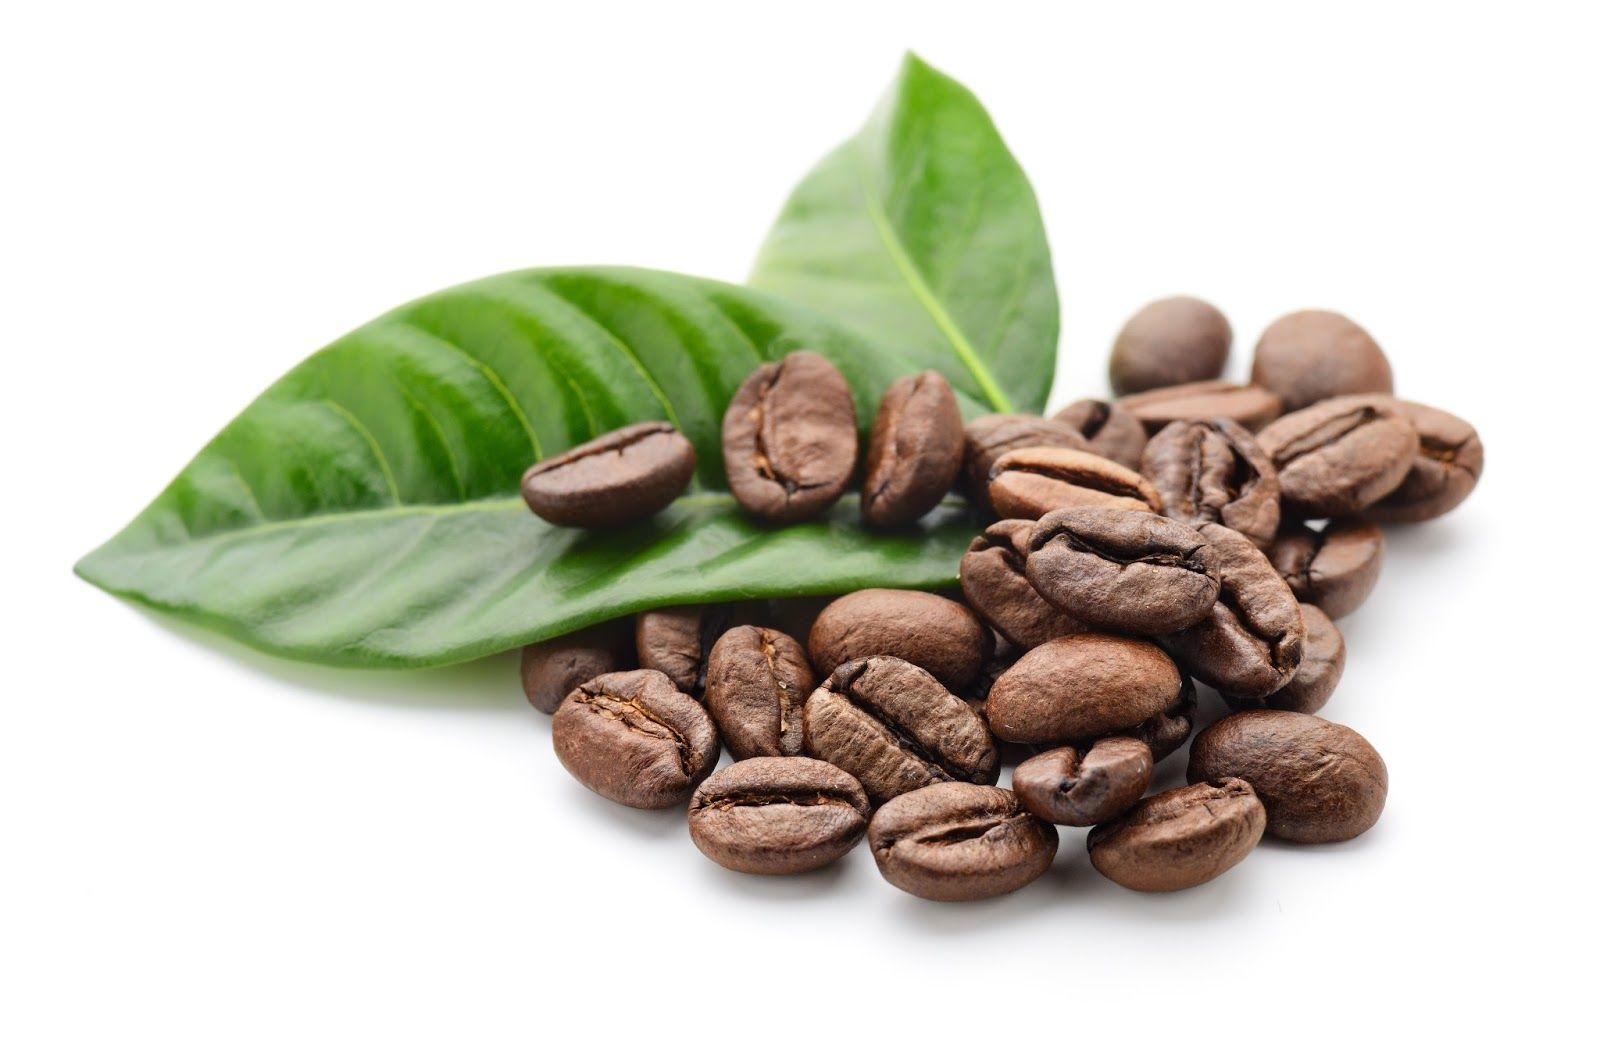 Beneficios Del Café Http Bit Ly 1gzqsc7 Granos De Café Verde Imágenes De Café